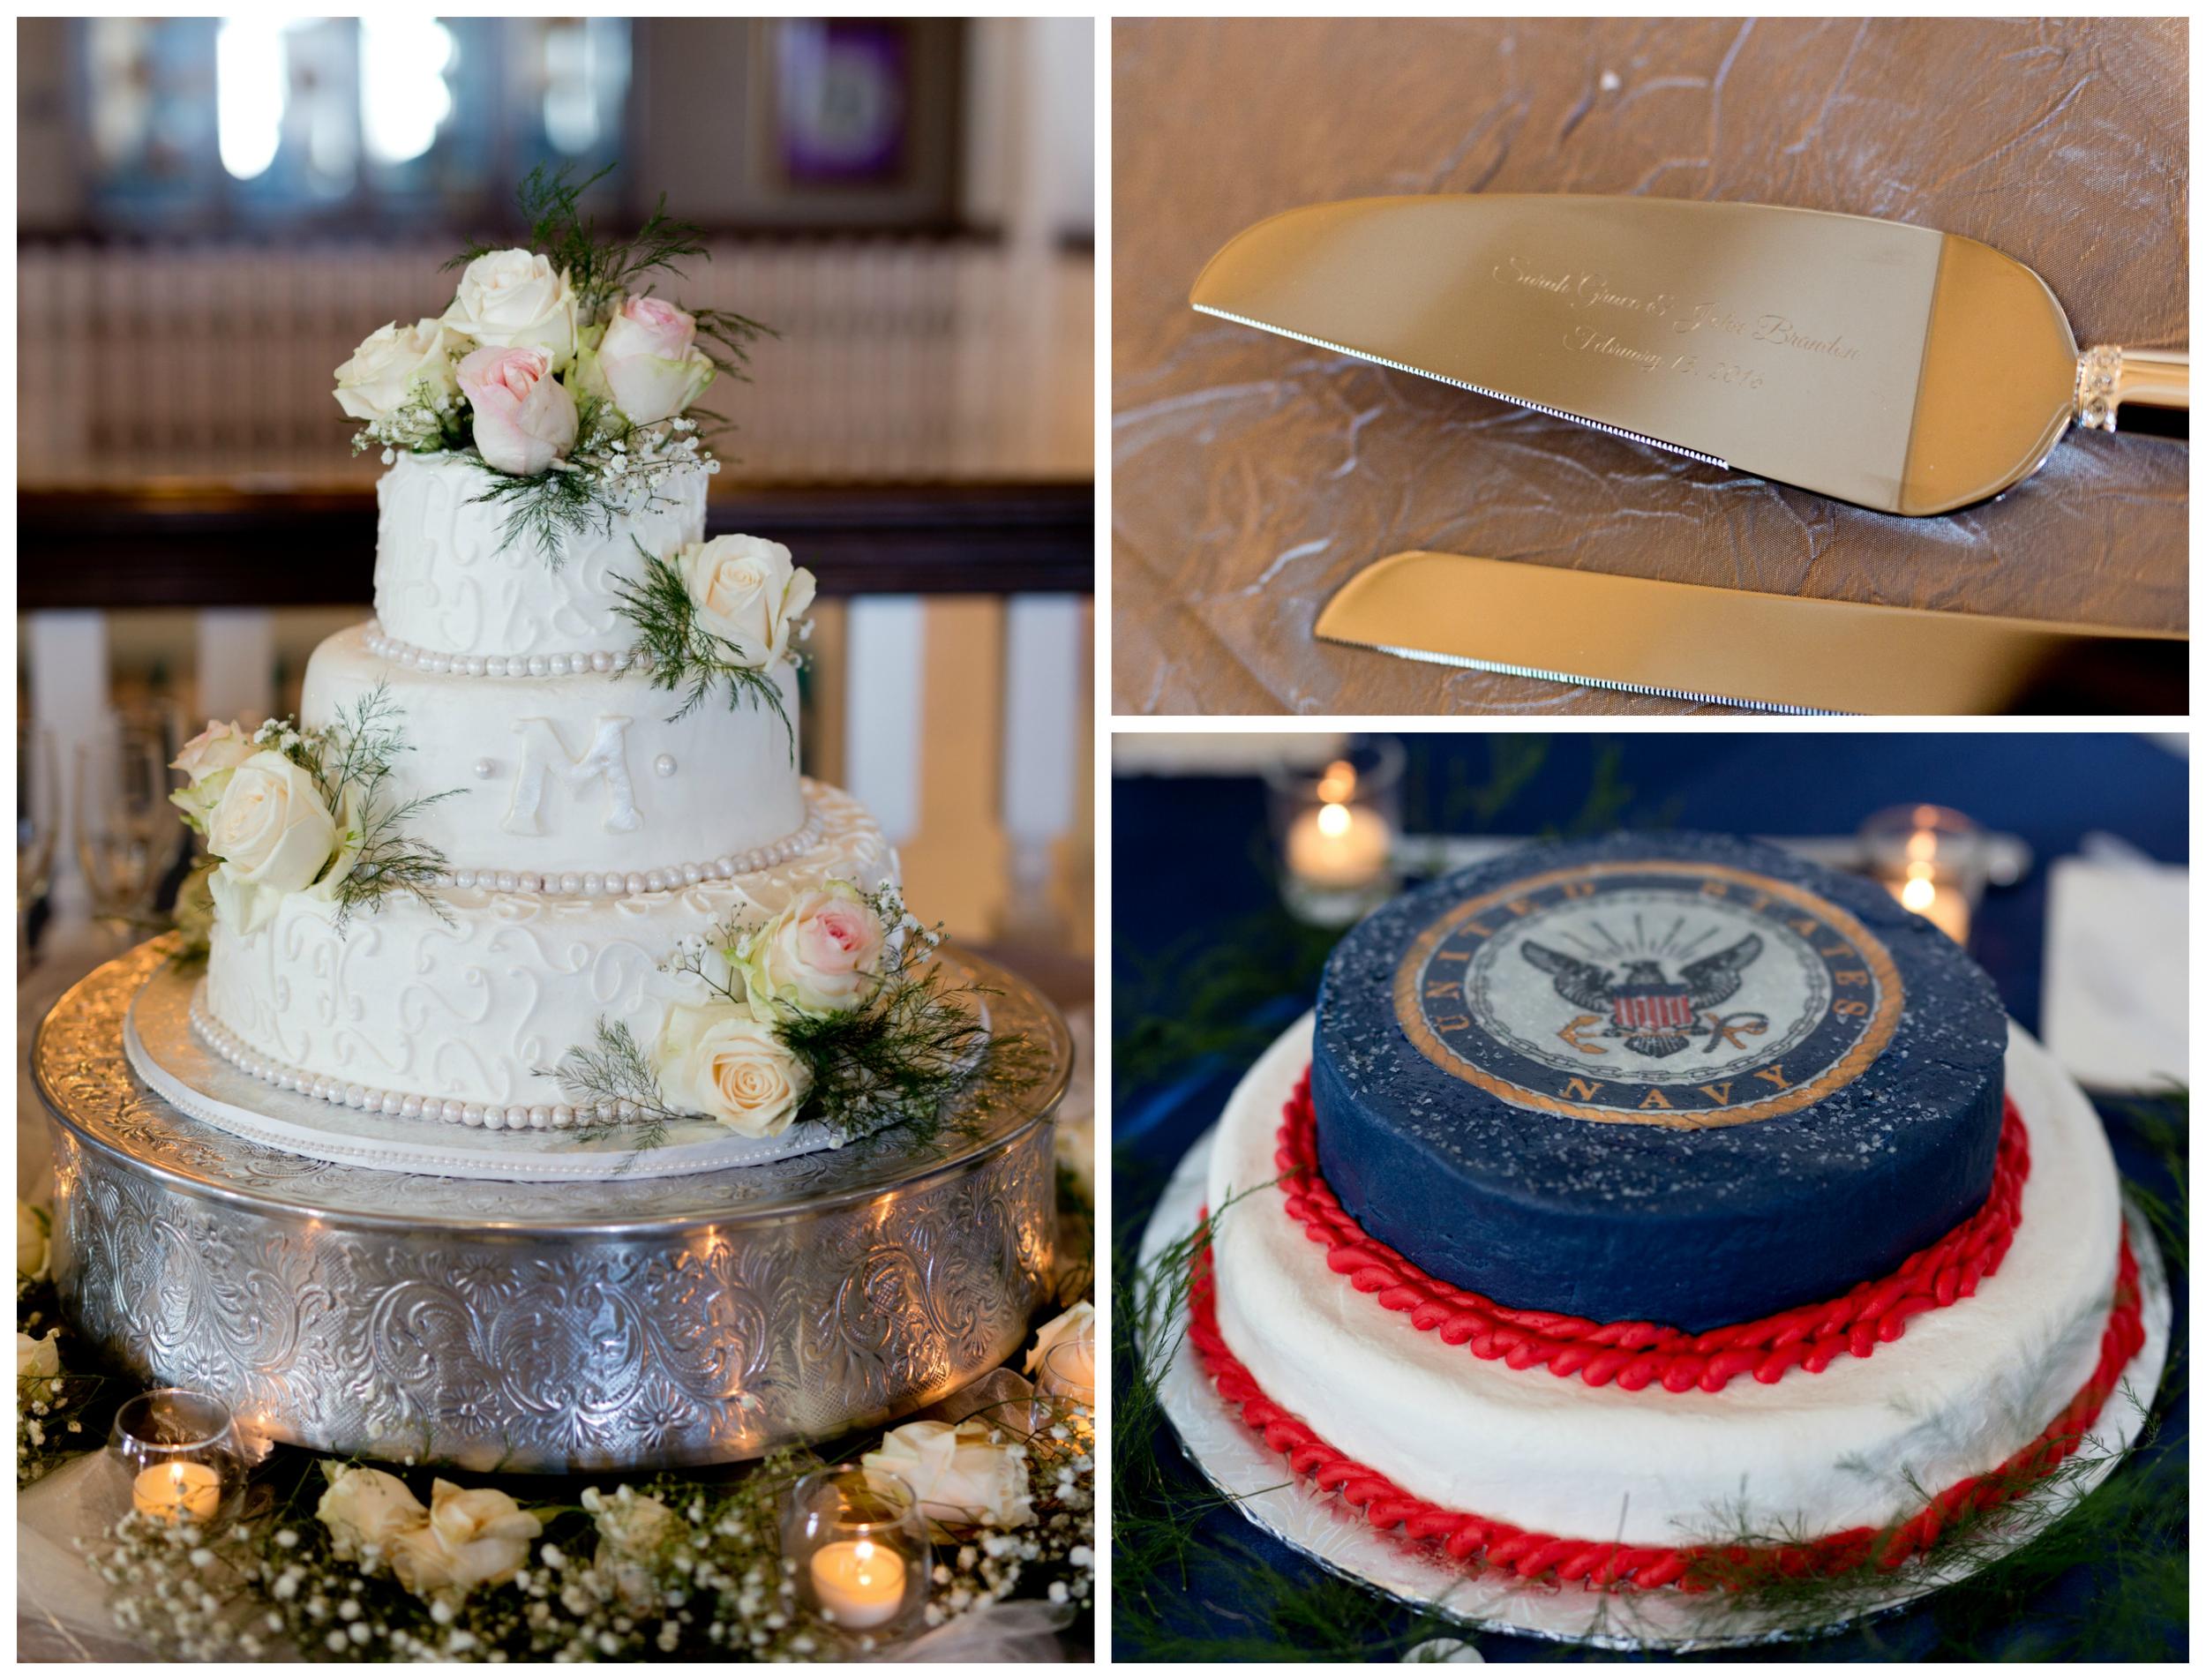 wedding cake and US Navy groom's cake